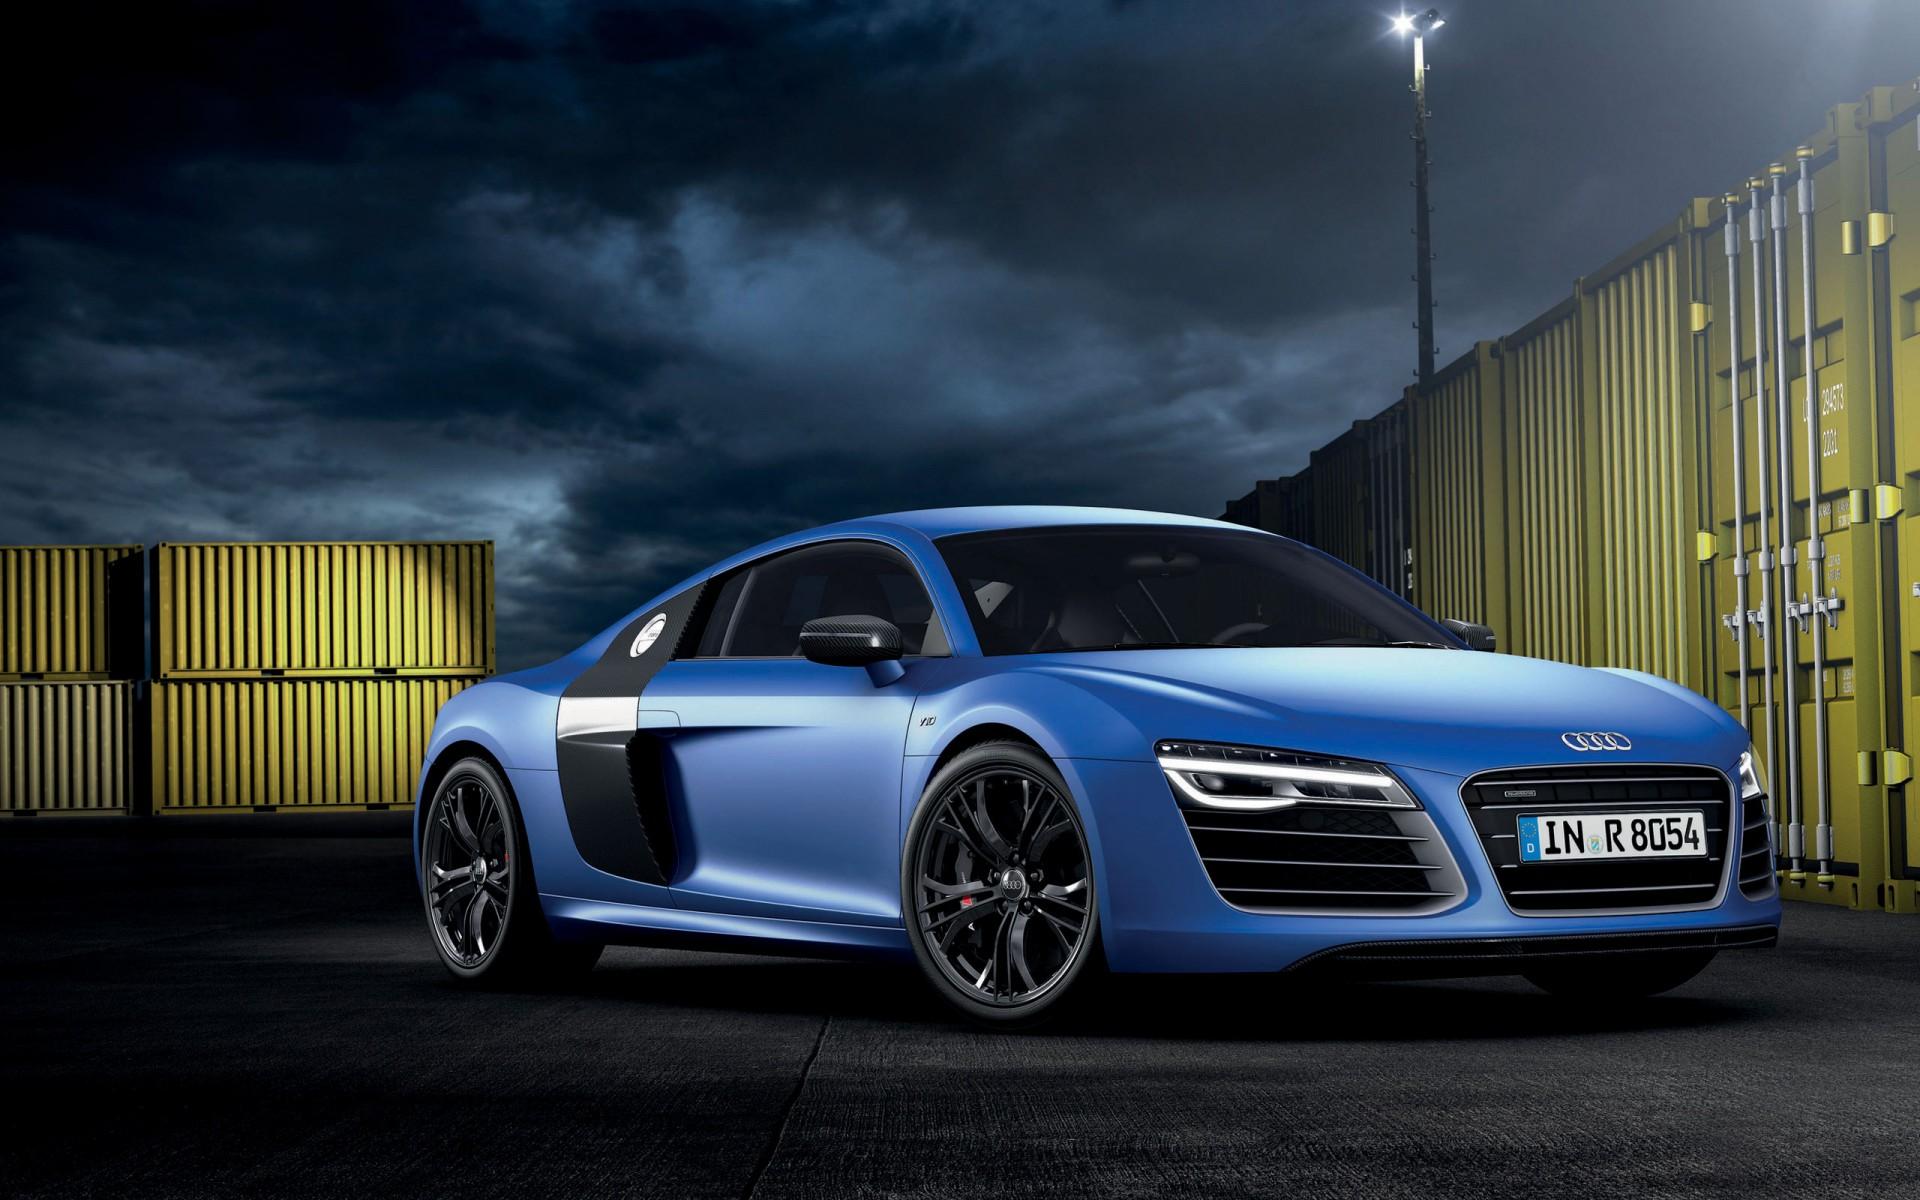 Audi R8 V10 Plus Wallpaper | HD Car Wallpapers | ID #3114